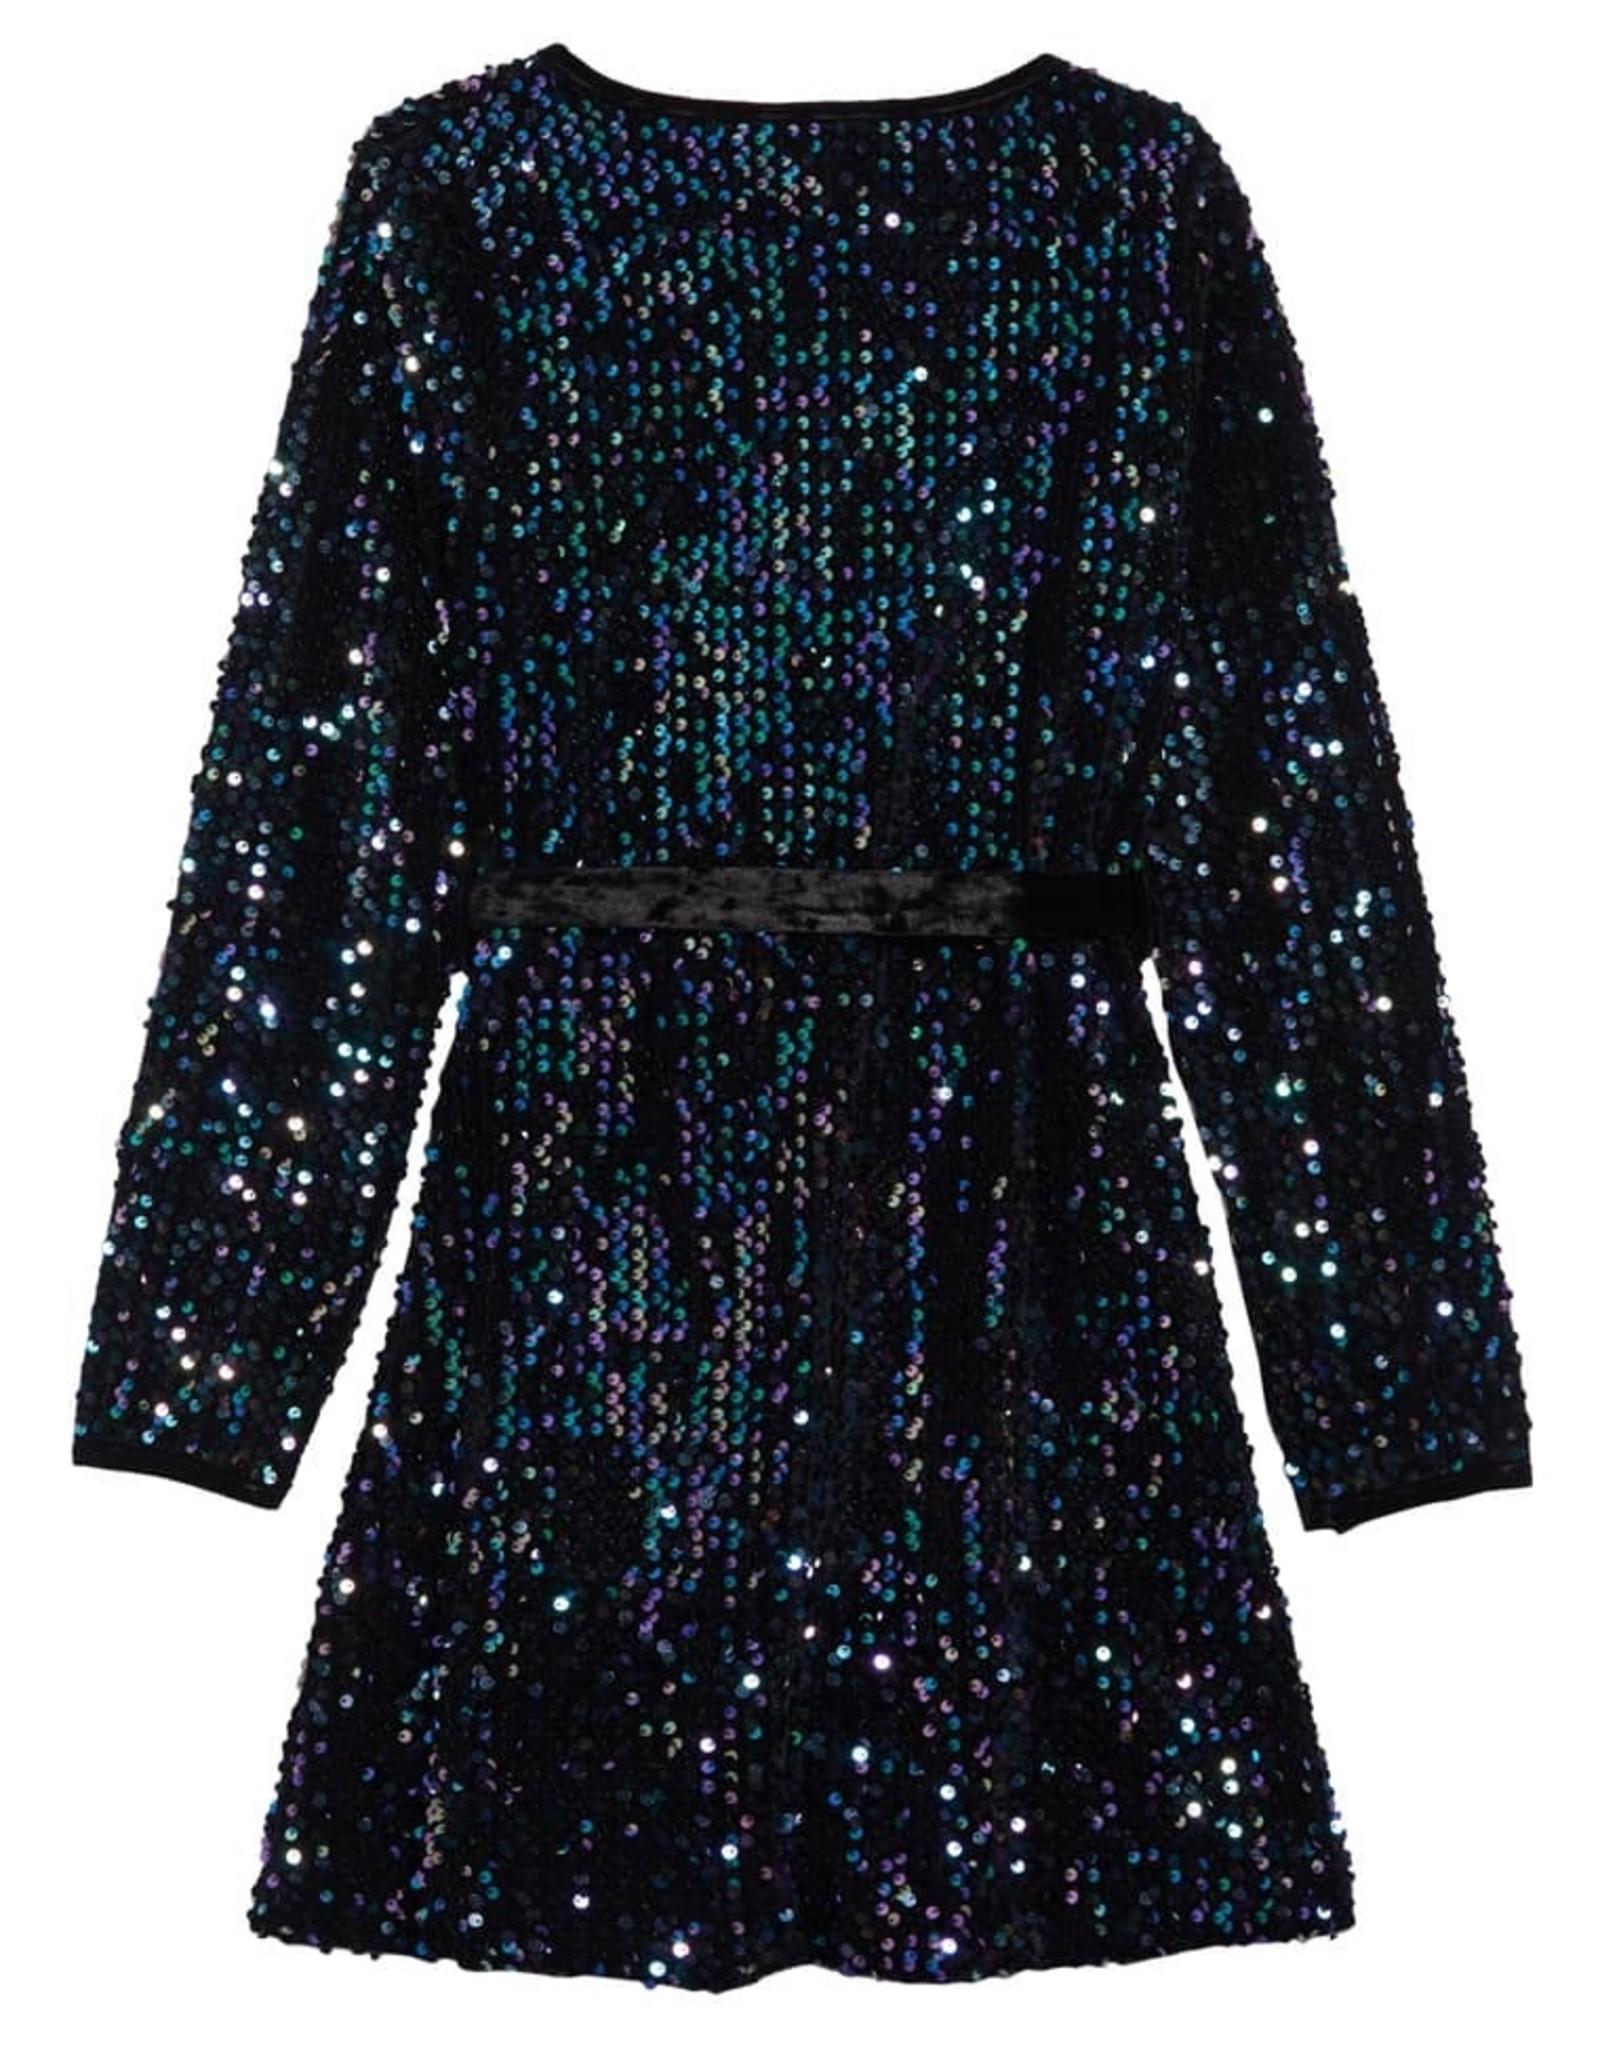 Habitual girl Habitual Girl Raven Multi Sequins Wrap Dress